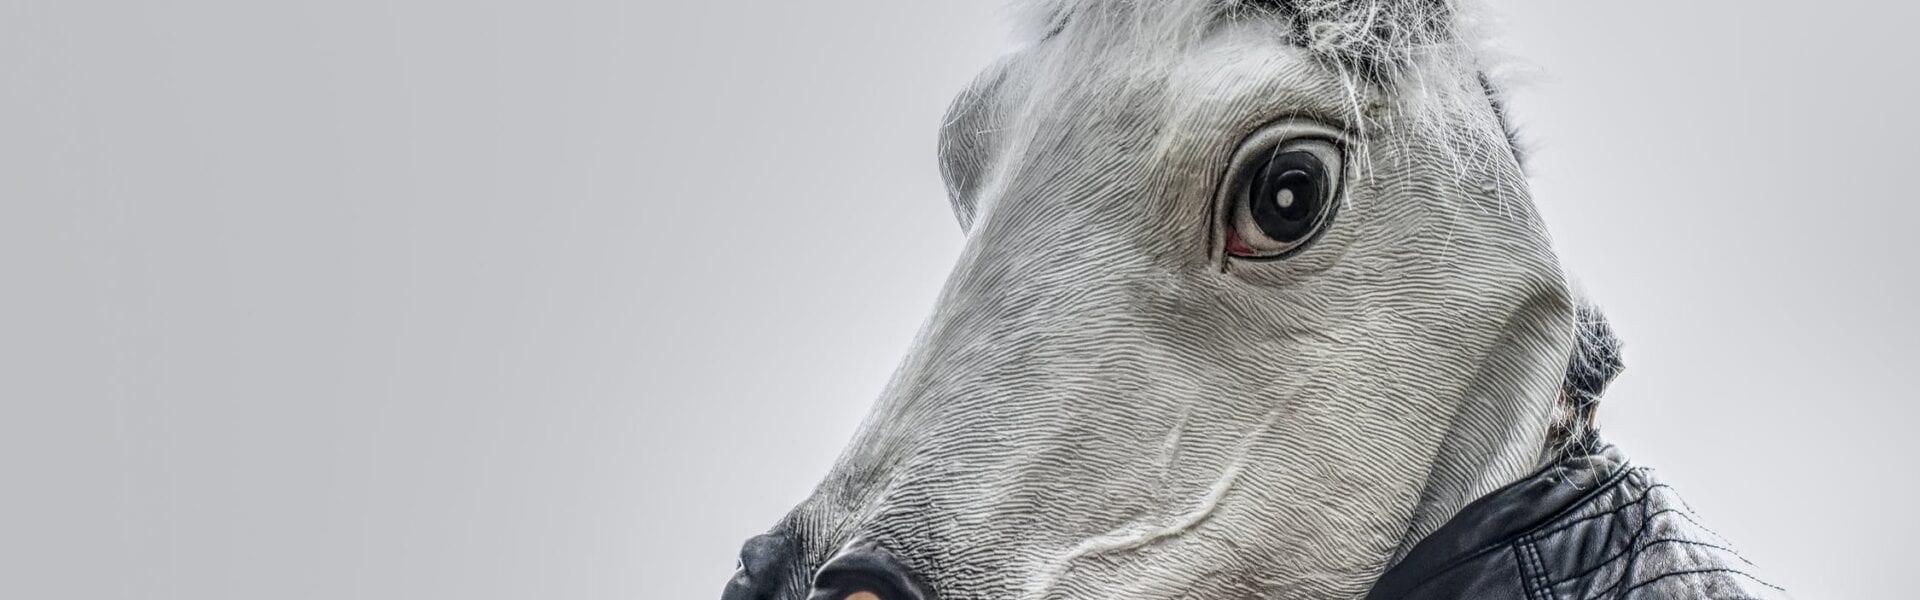 A human wearing a horse head mask